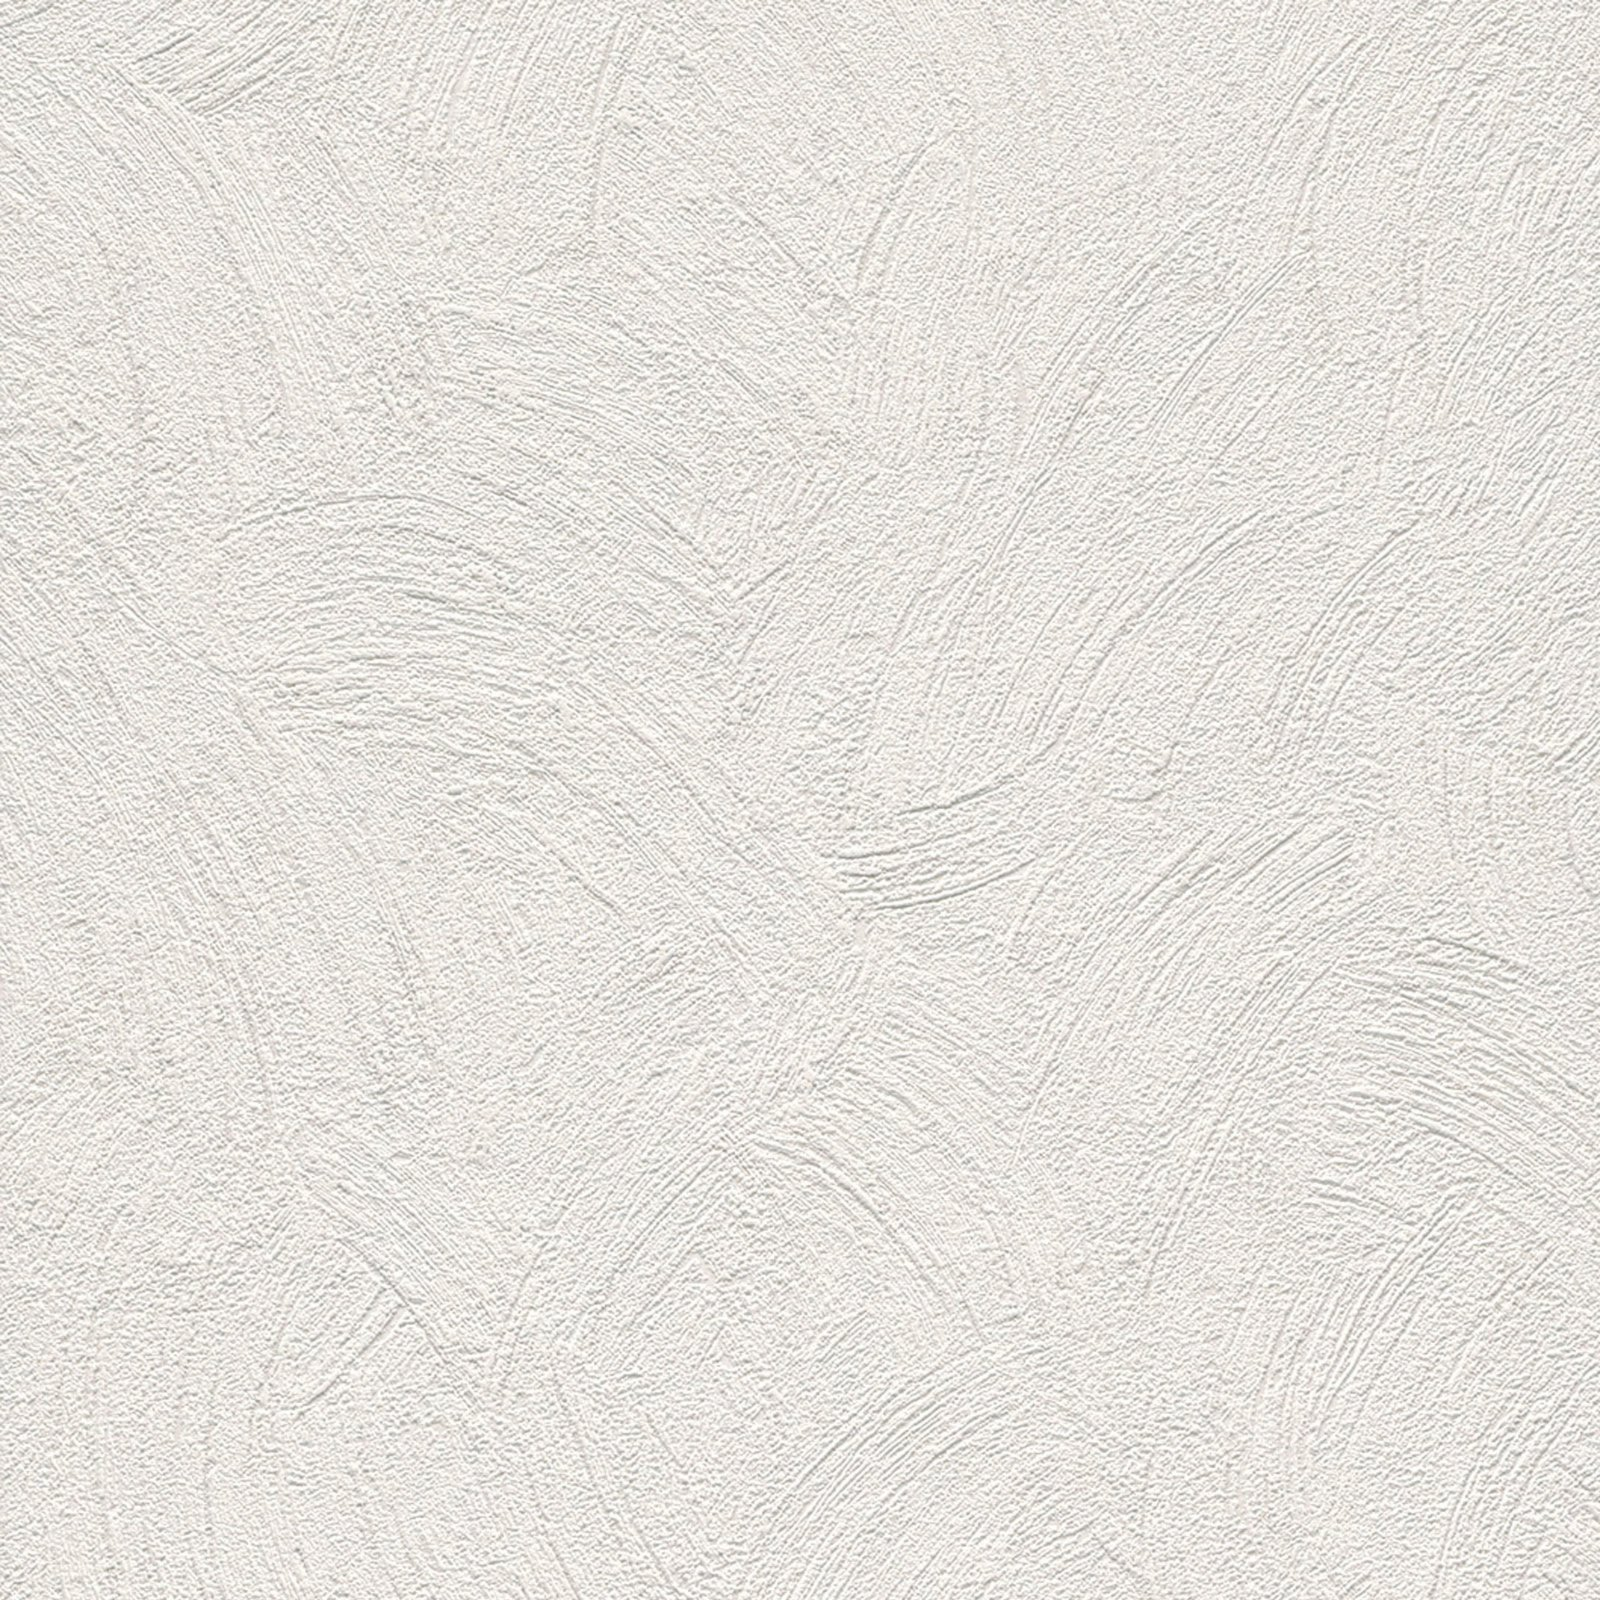 Vliestapete beige putzstruktur 10 meter for Tapeten roller